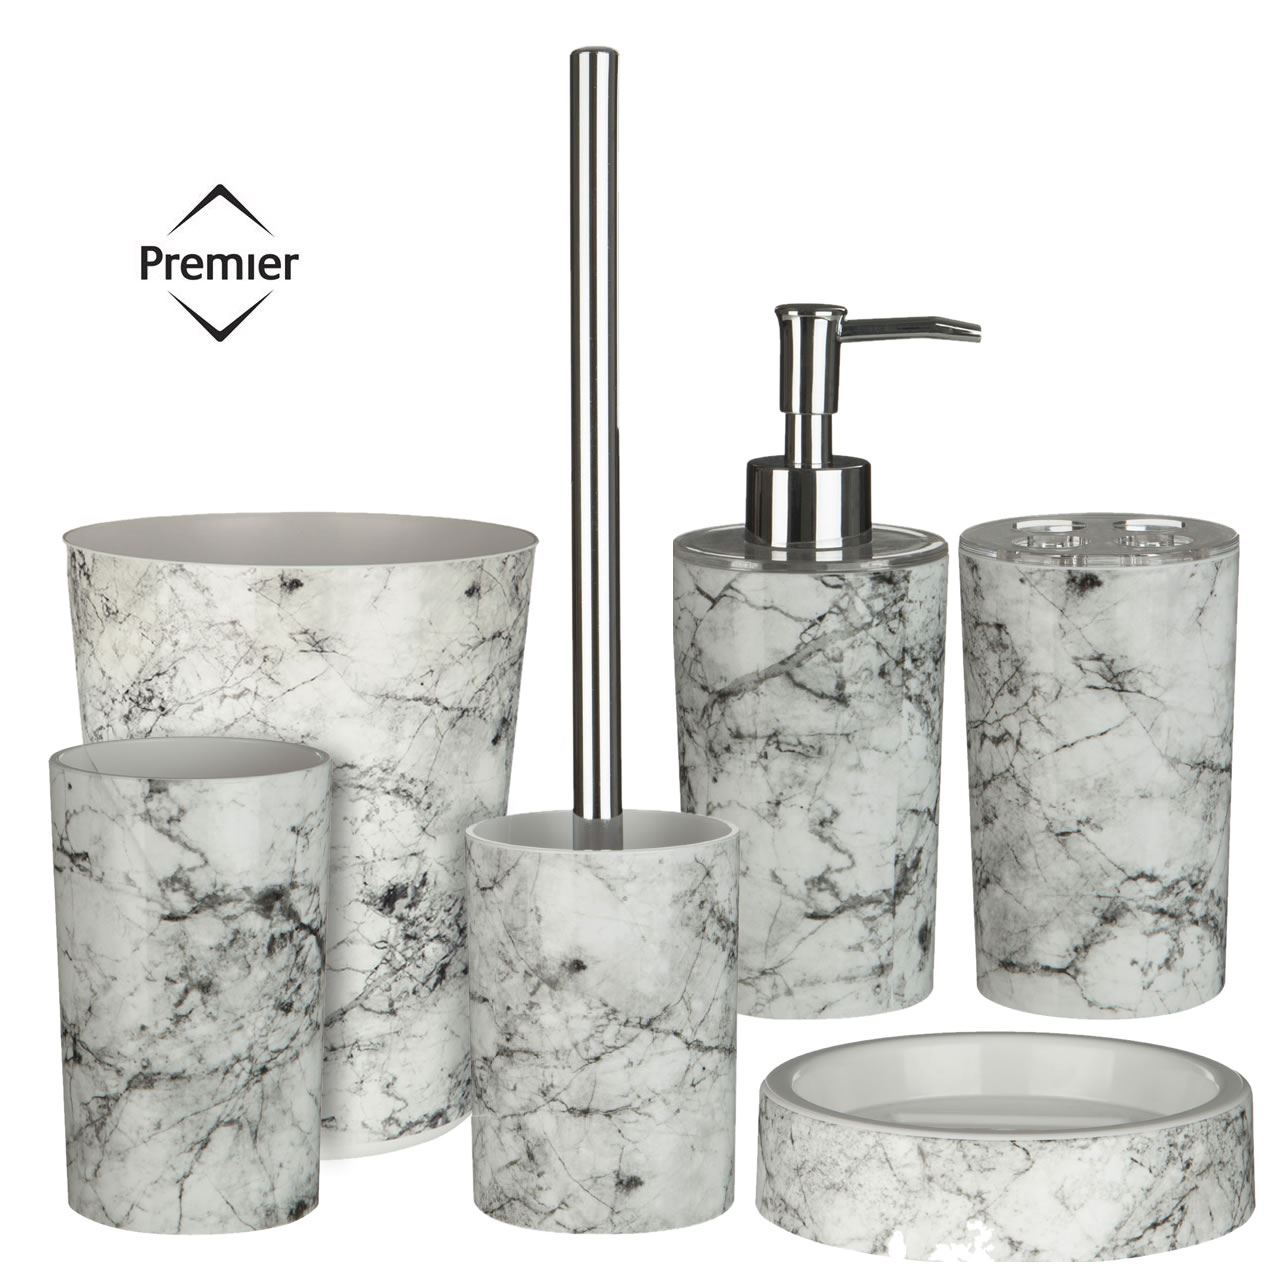 6Pc Rome Bathroom Set - Toilet Brush Tumbler Soap Dispenser Cotton ...